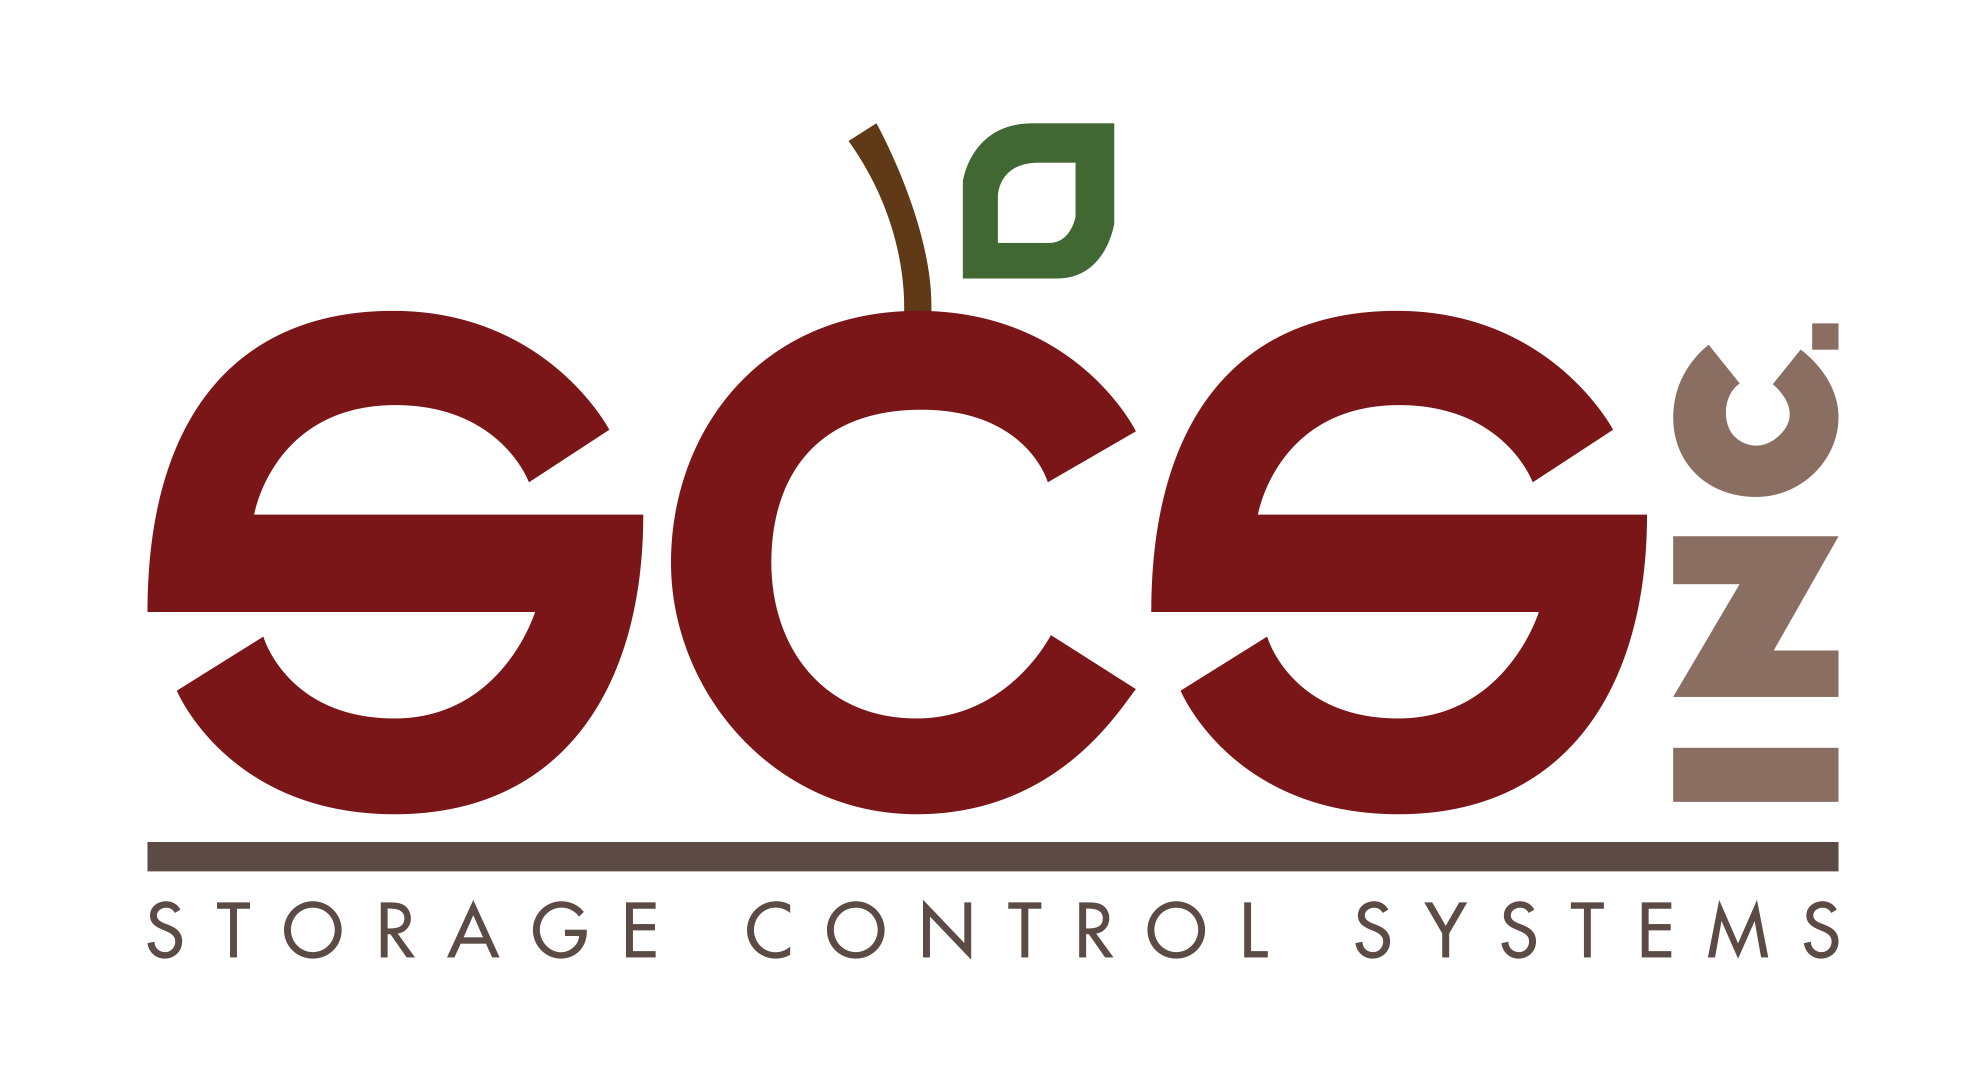 Storage Control Systems